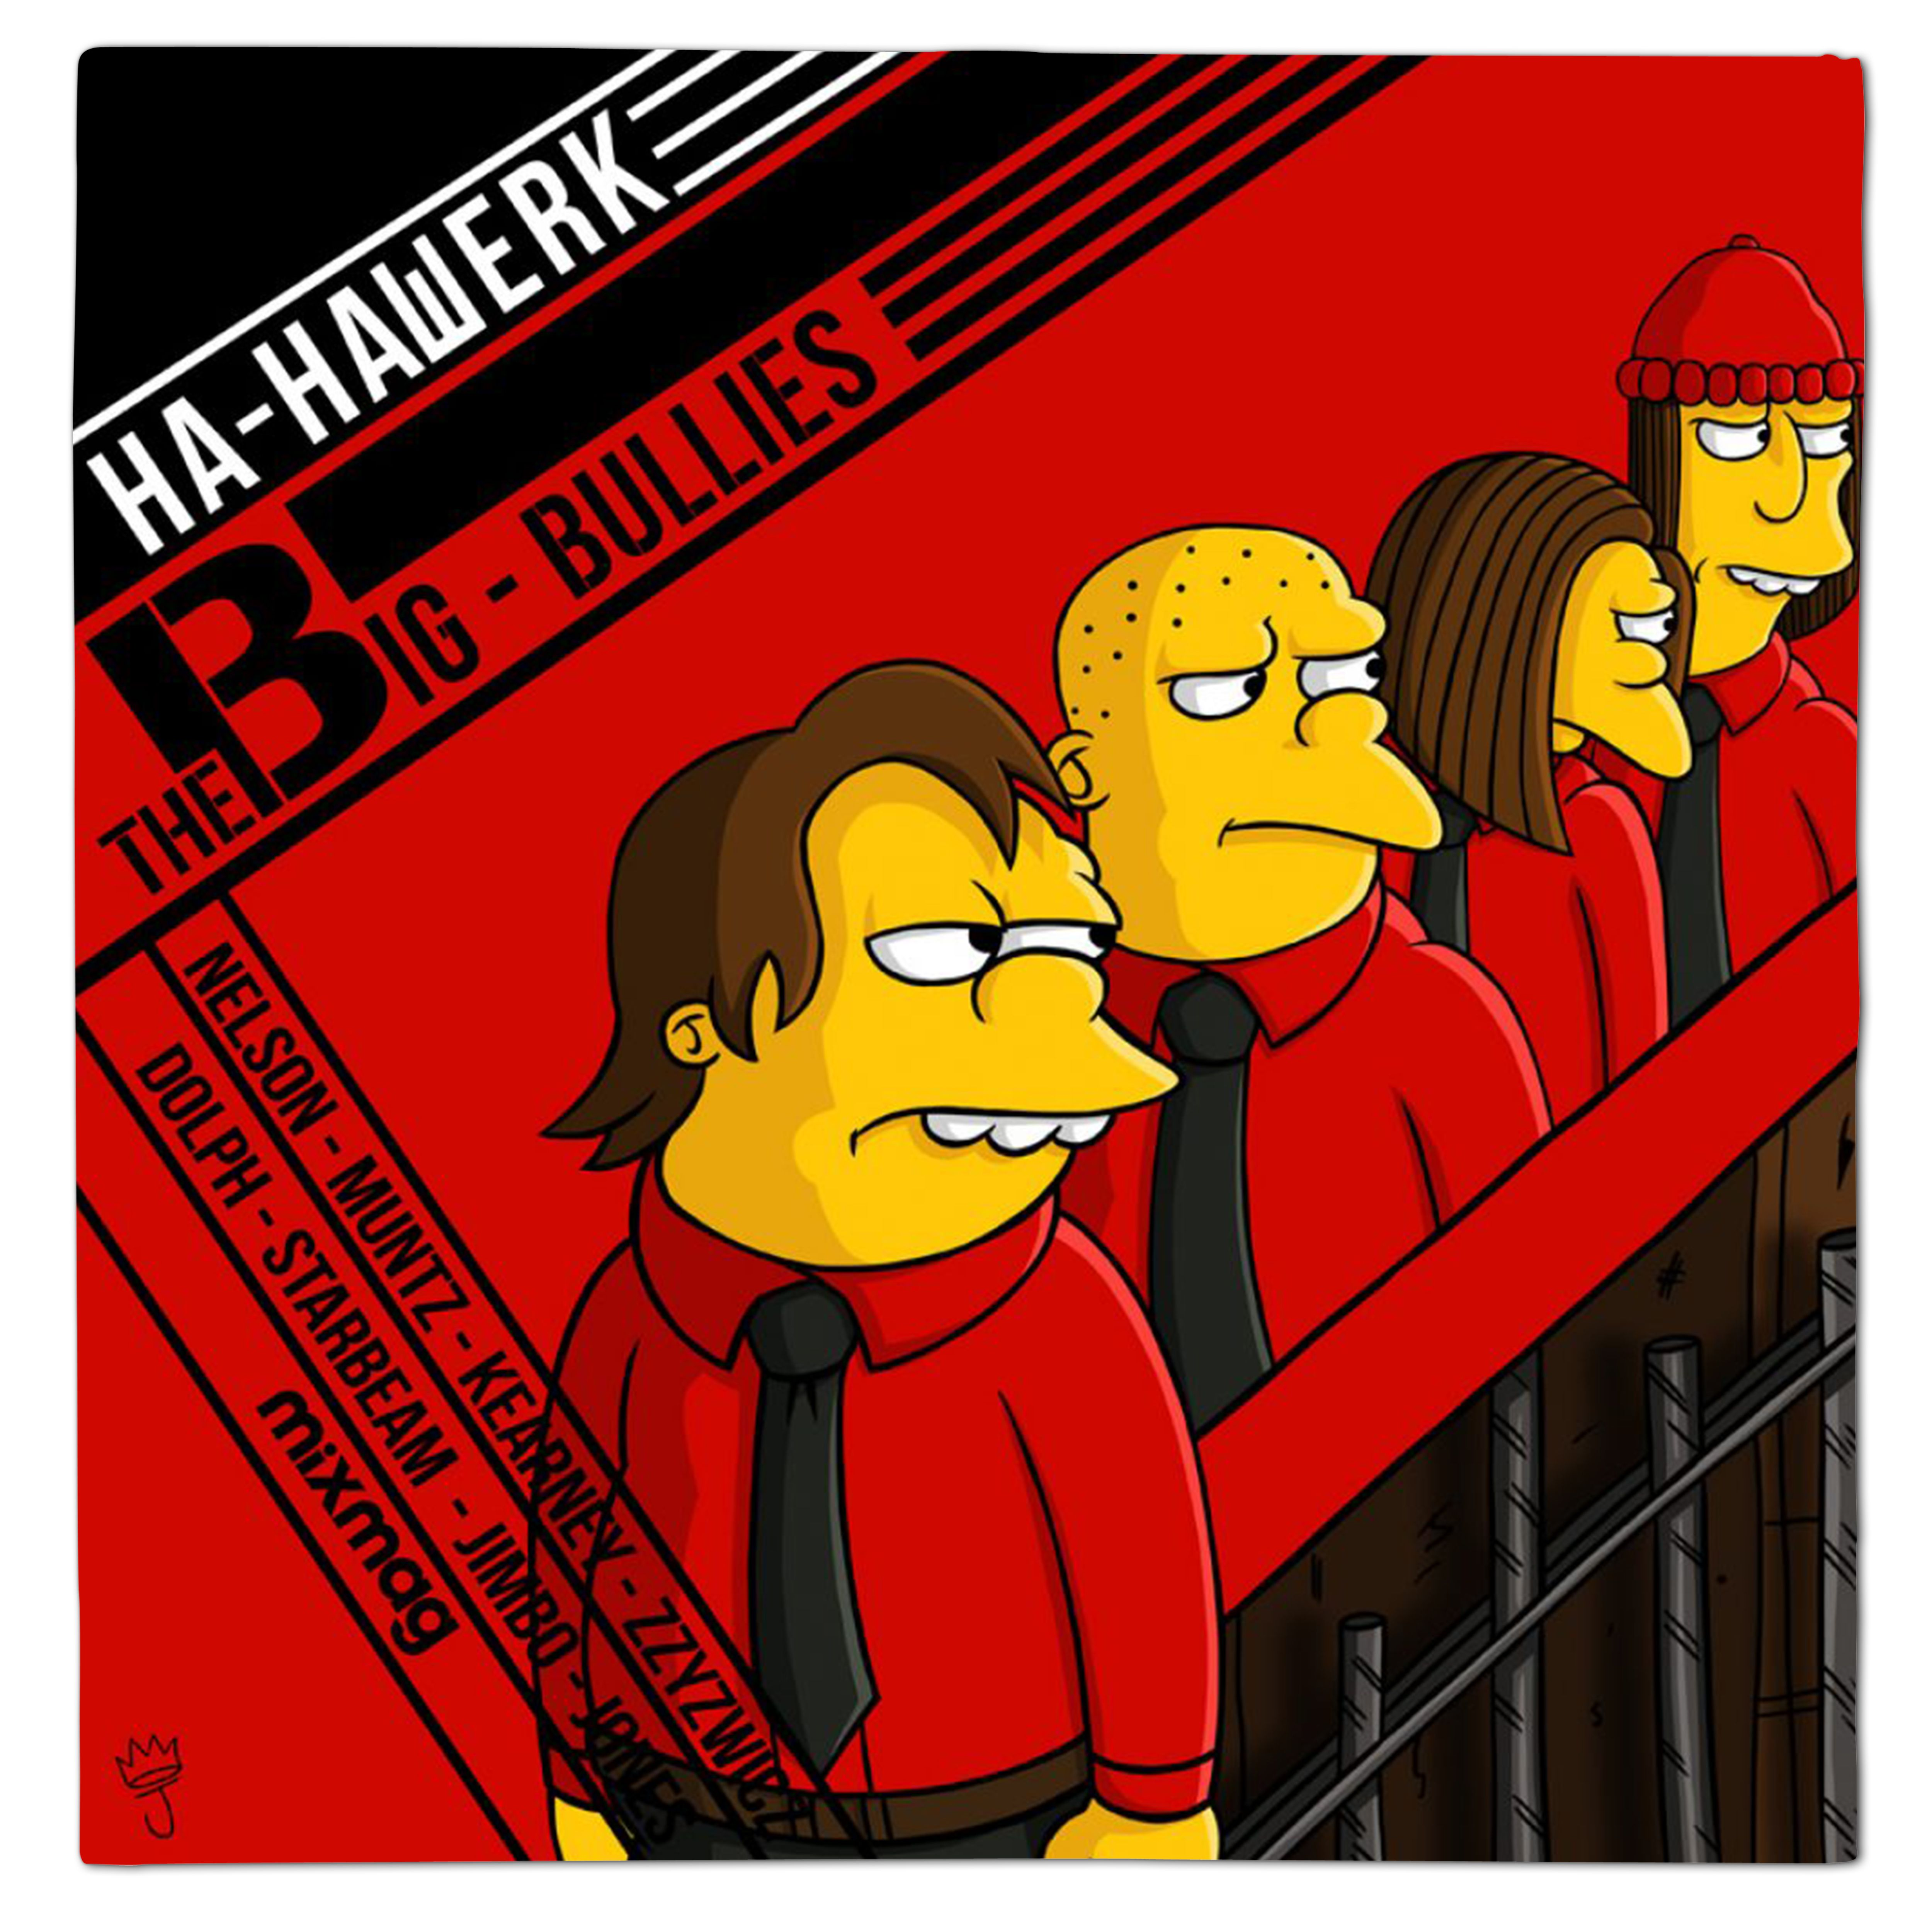 Kraftwerk Man Machine Simpsons Vinyl Mash Up Parody By